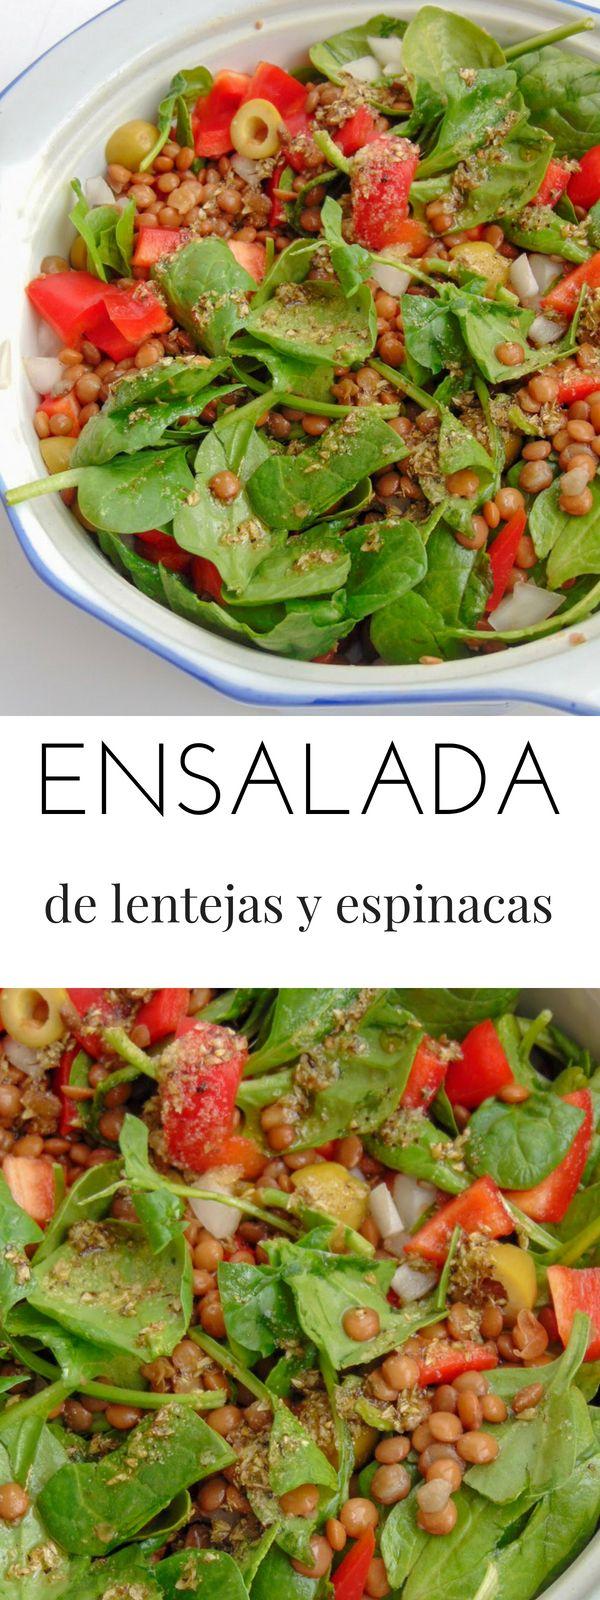 Ensalada de lentejas y espinacas frescas Appetizer Recipes, Appetizers, Bon Appetit, Green Beans, Nom Nom, Salads, Recipies, Tasty, Healthy Recipes